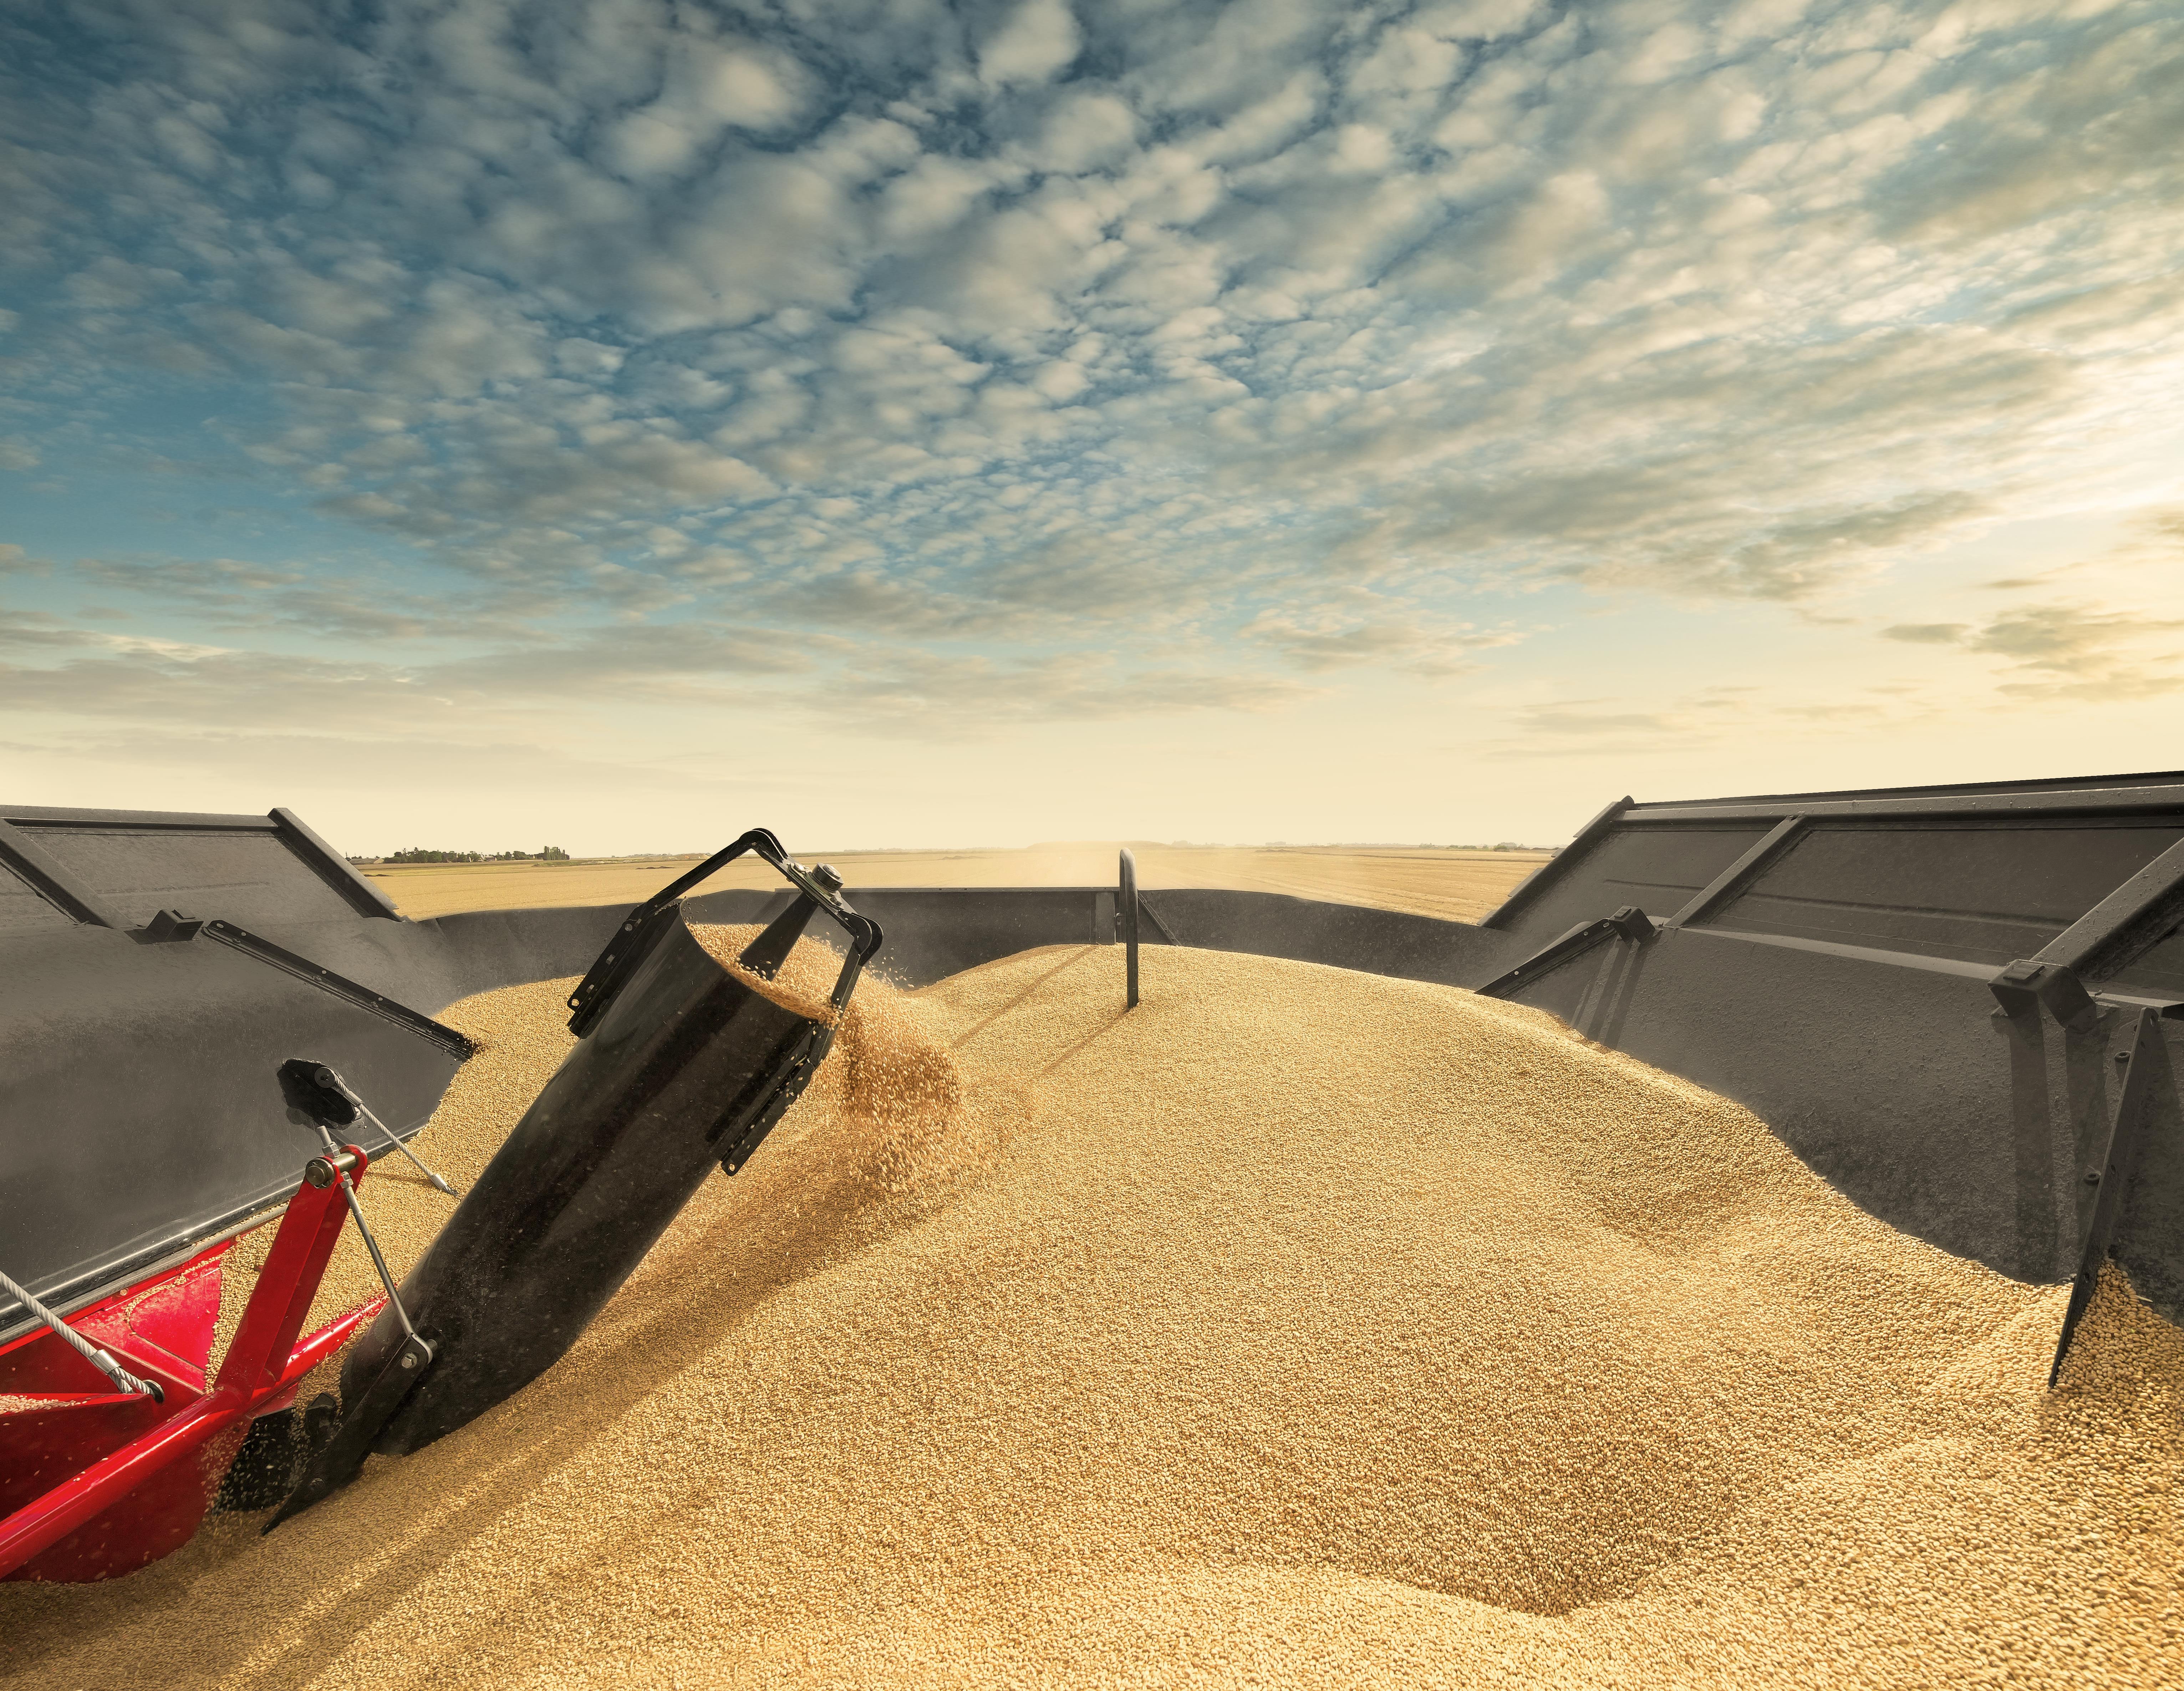 Grain Handling